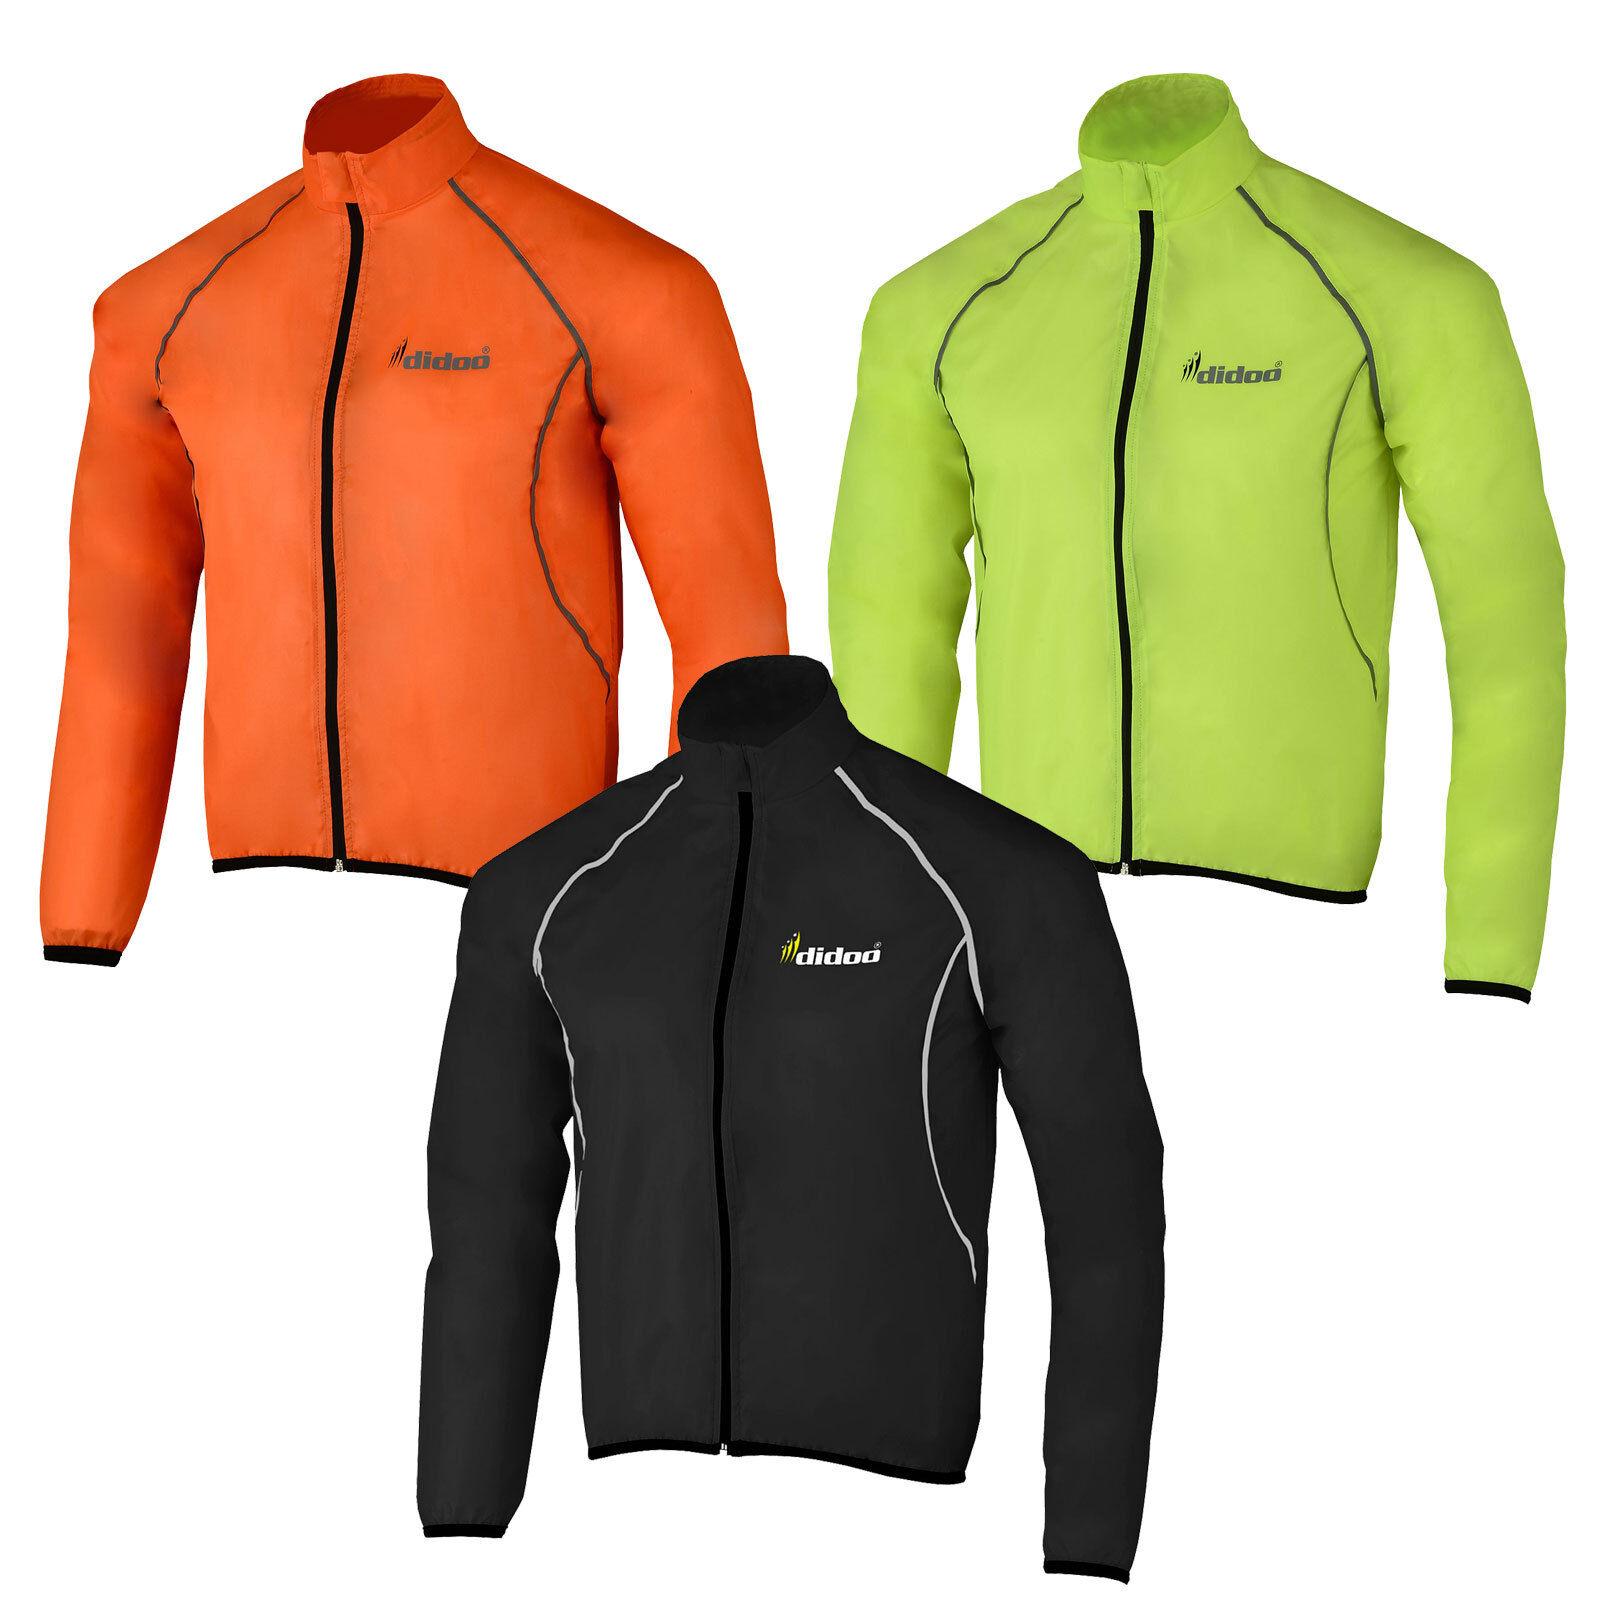 Mens cycling jacket high visibility waterproof running top for Hi viz running shirt